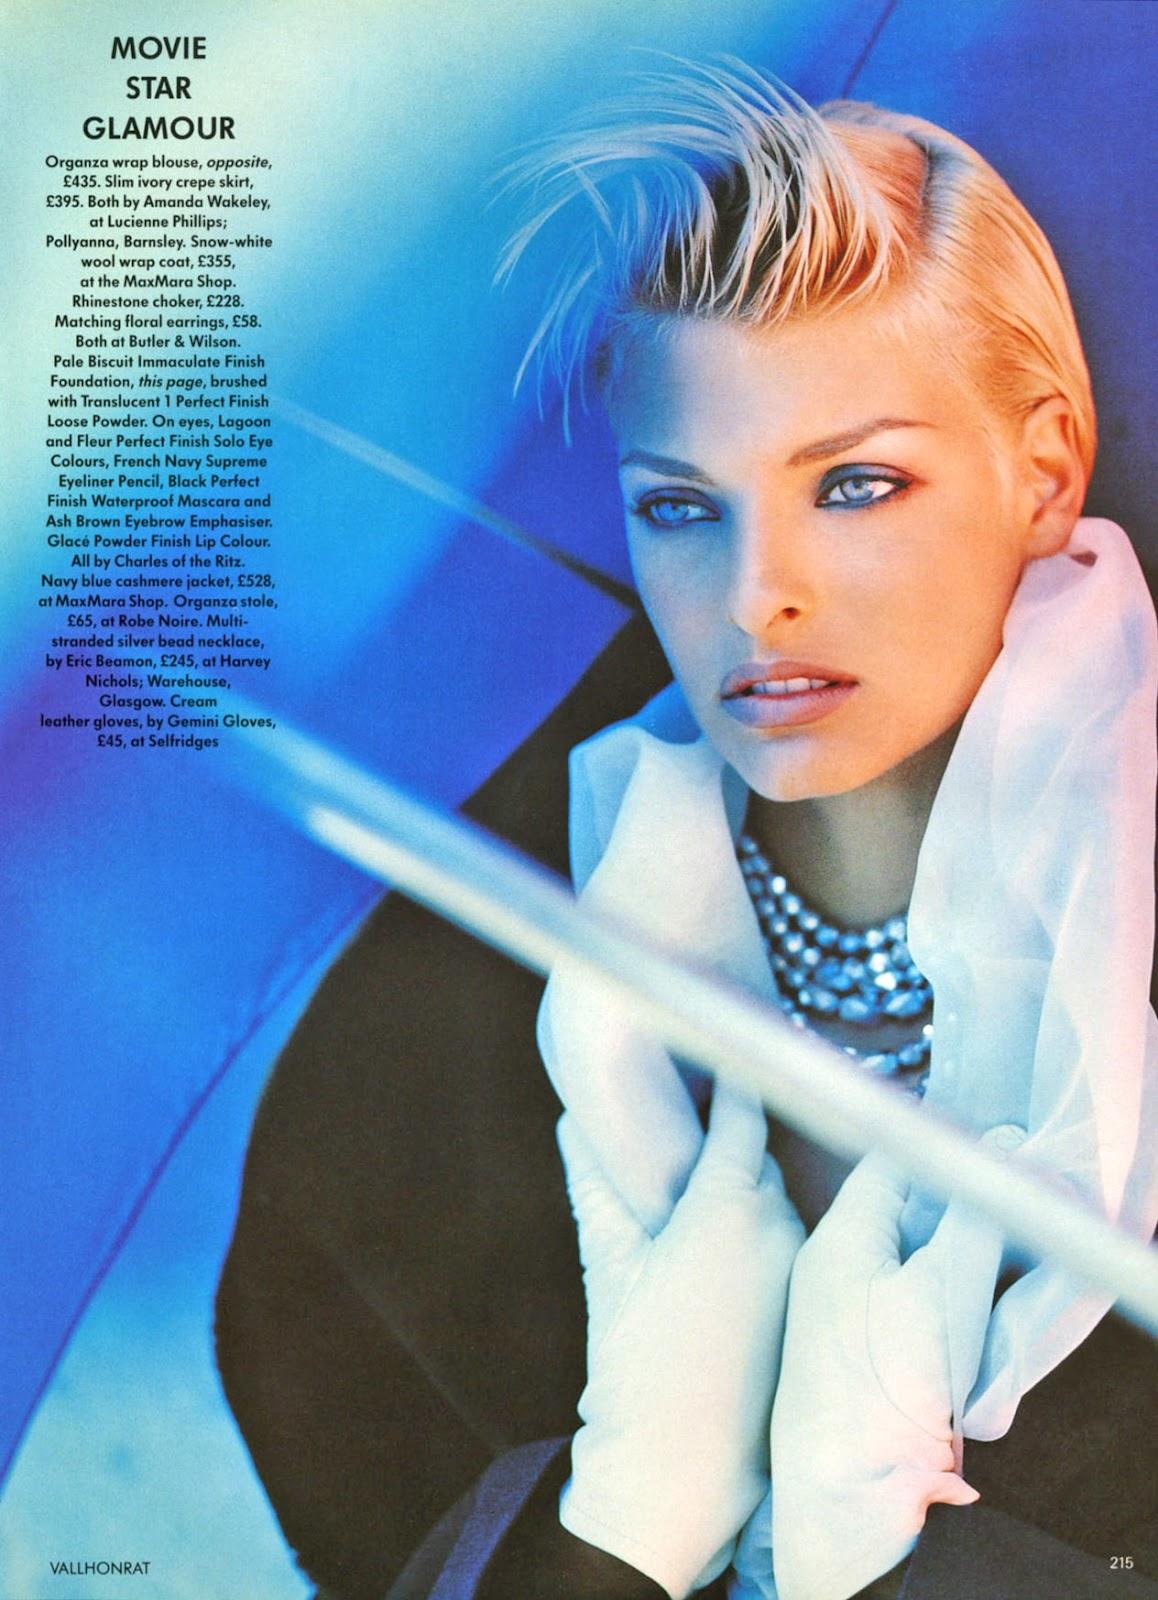 http://4.bp.blogspot.com/-TIg2lN7Wf6M/T0fJ1QRKeDI/AAAAAAAABC0/PKhlfMz7Z5g/s1600/Linda+Evangelista+1991+09+Vogue+Uk+Ph+Javier+Vallhonrat+04.jpg